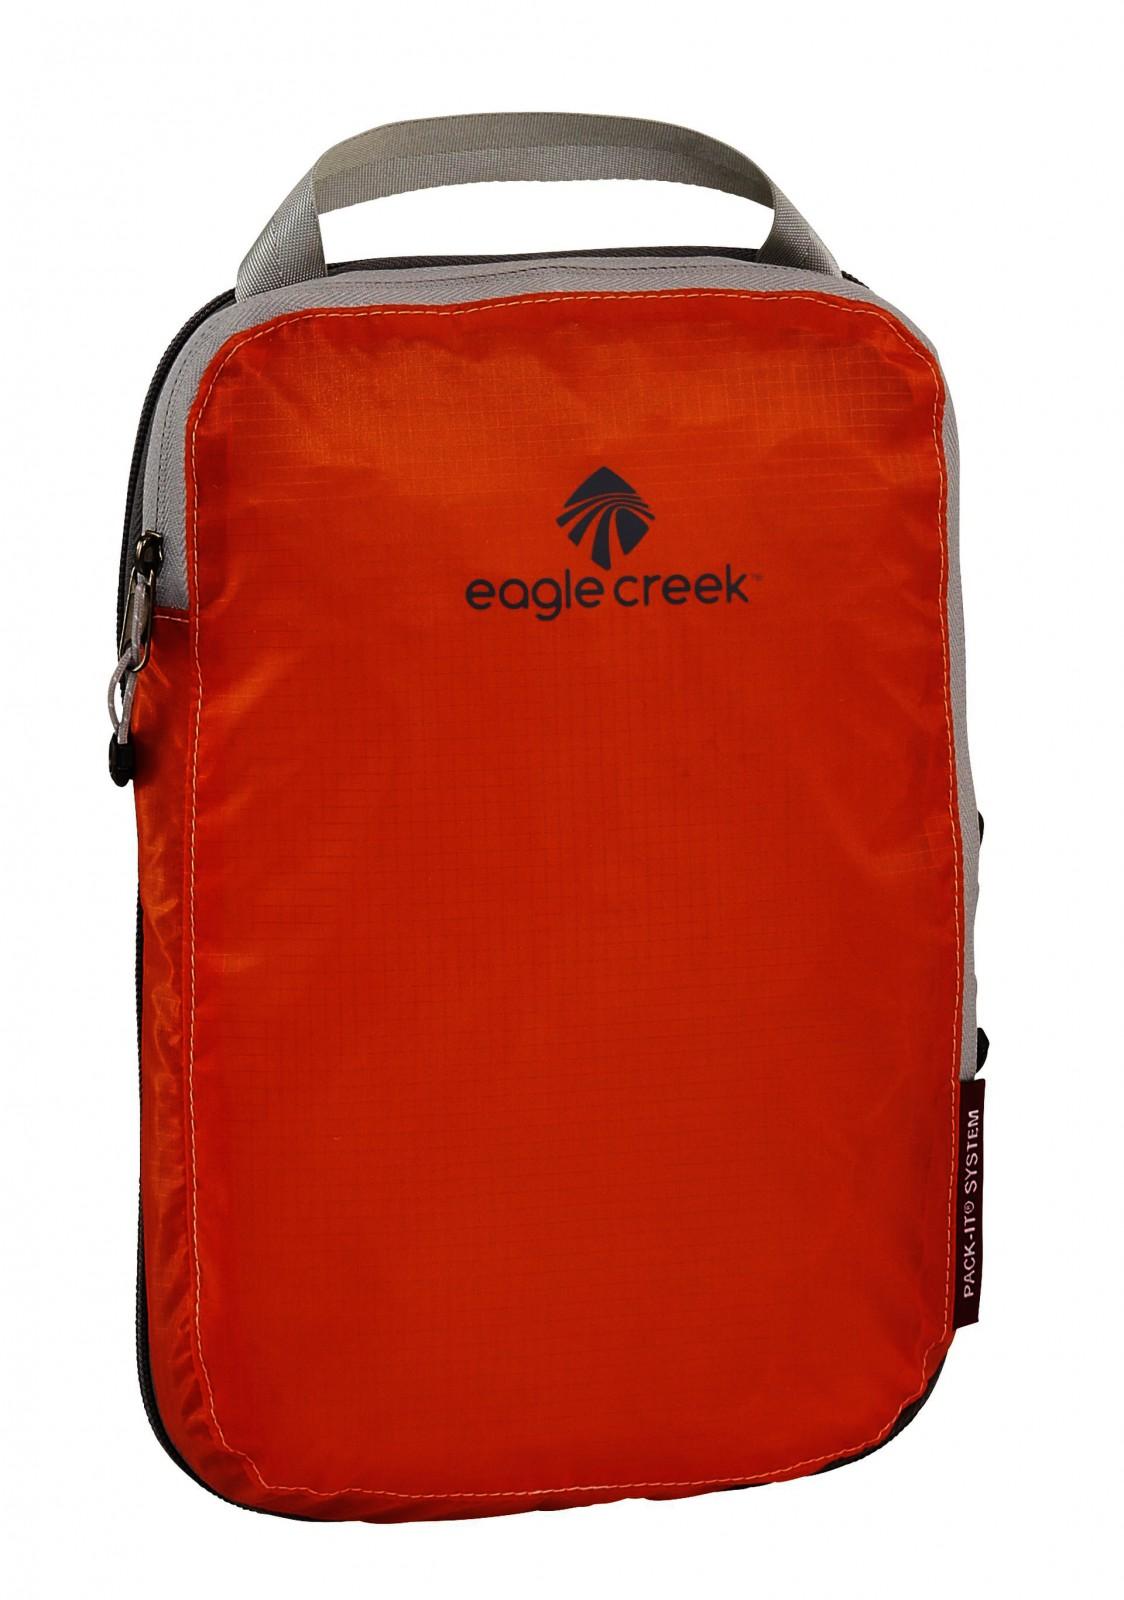 eagle creek Pack-It Specter Compression Half Cube S Flame Orange